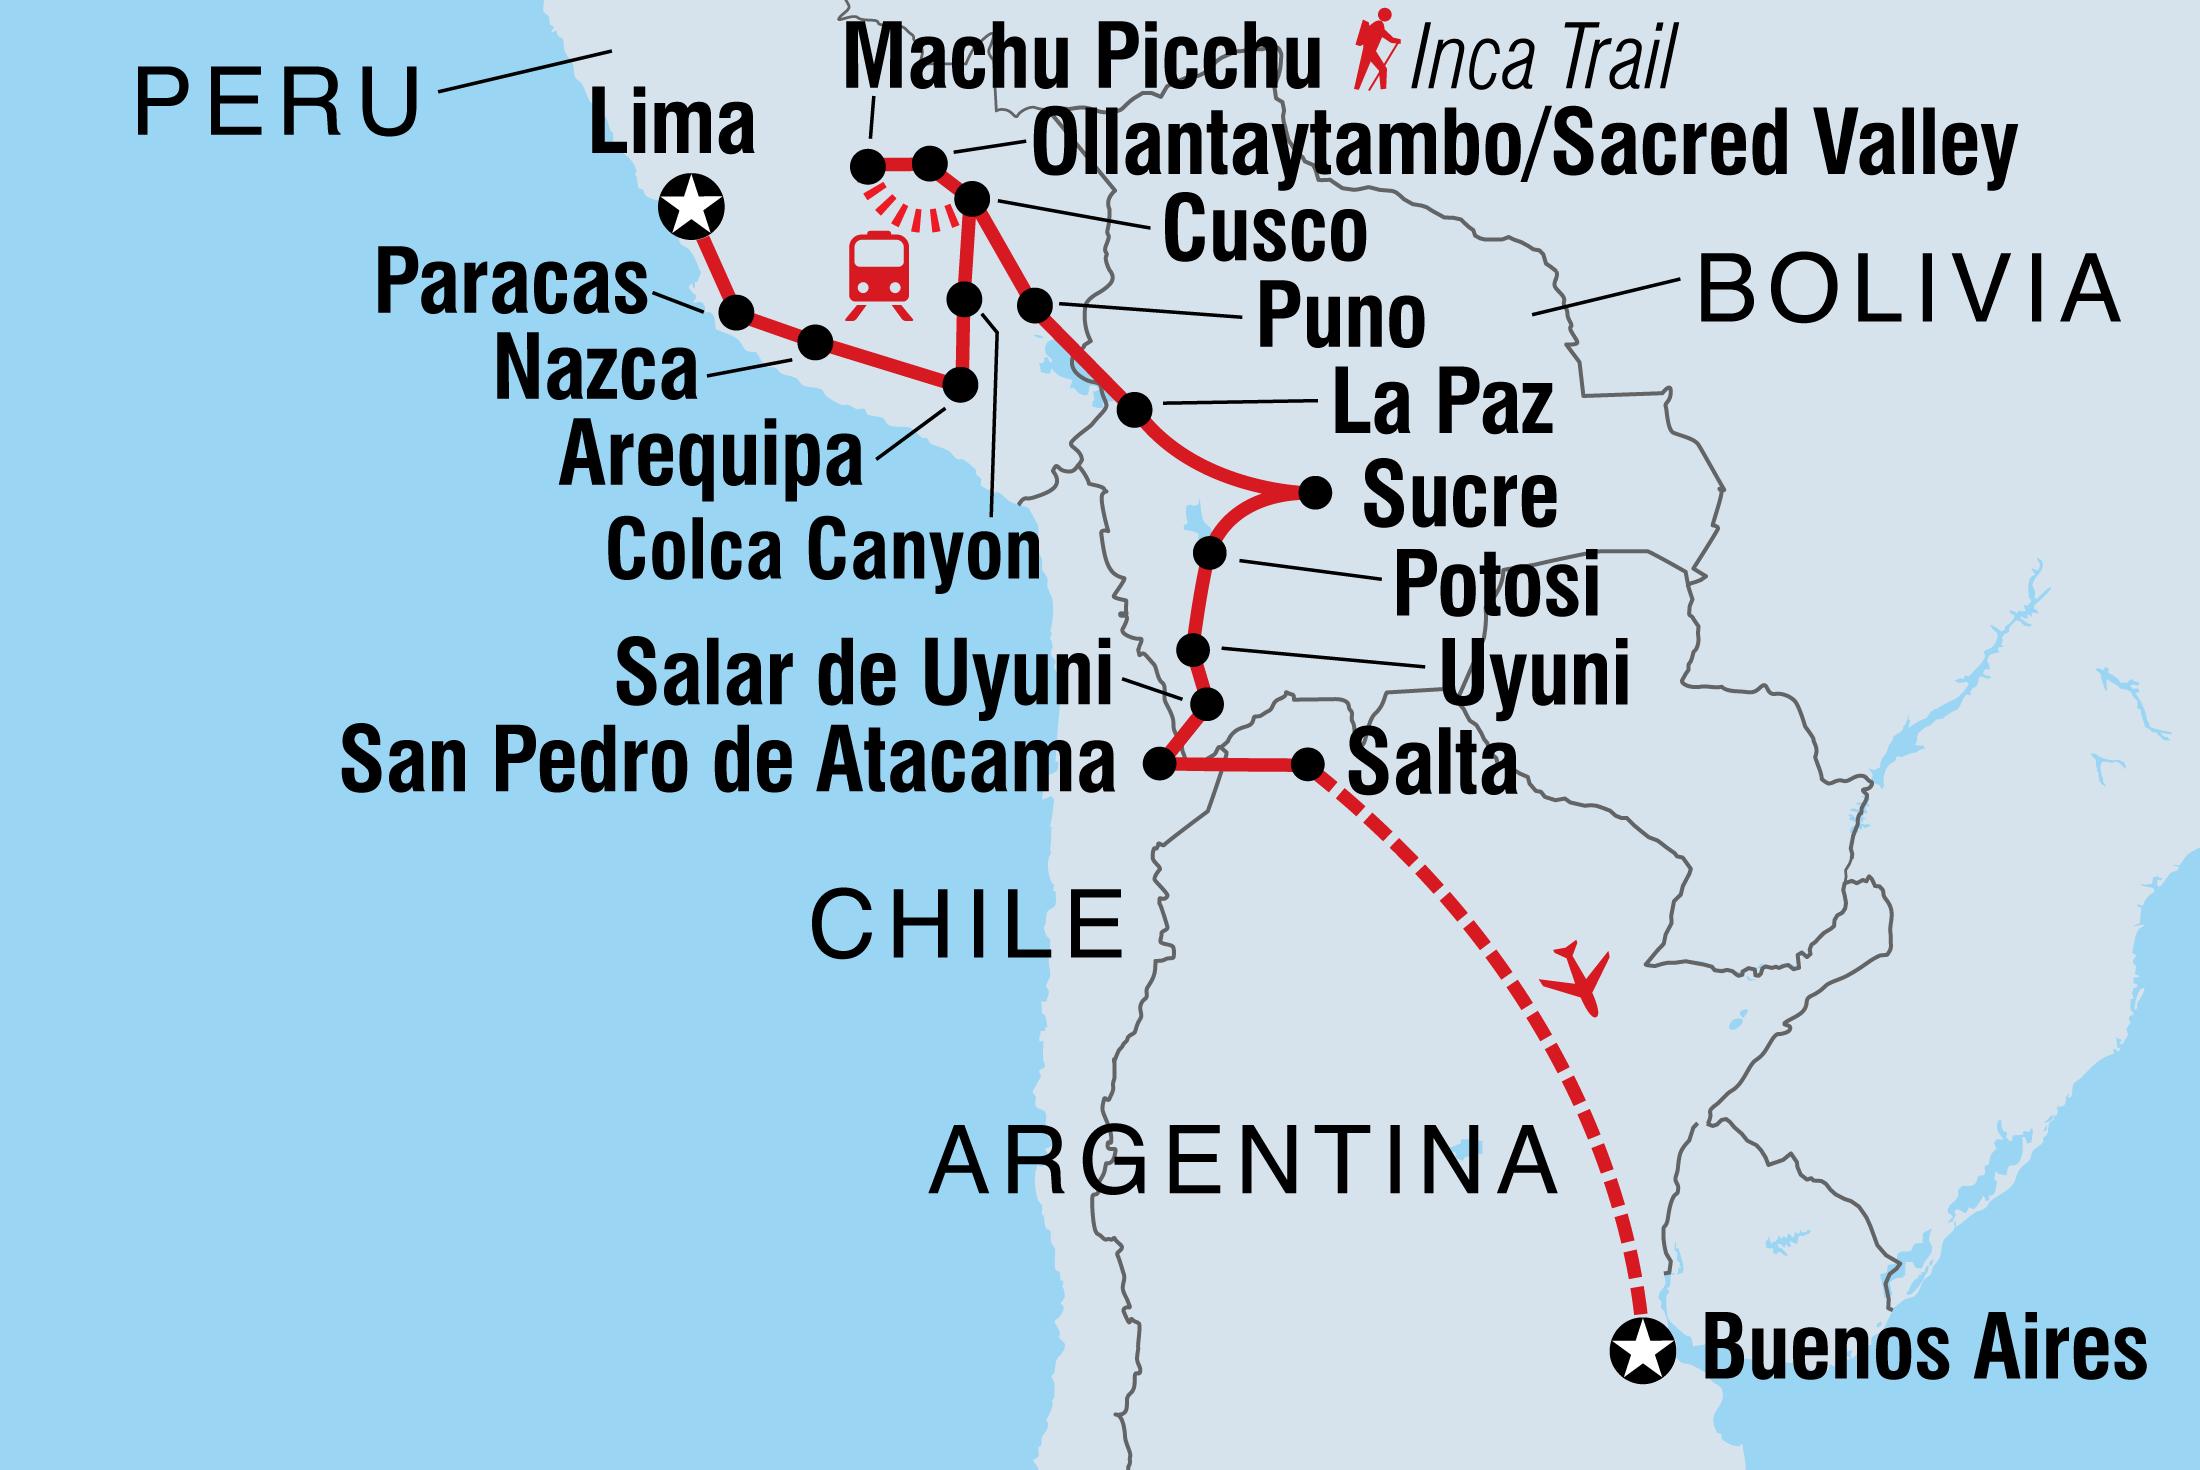 Image of Adventure through Peru, Bolivia & Argentina